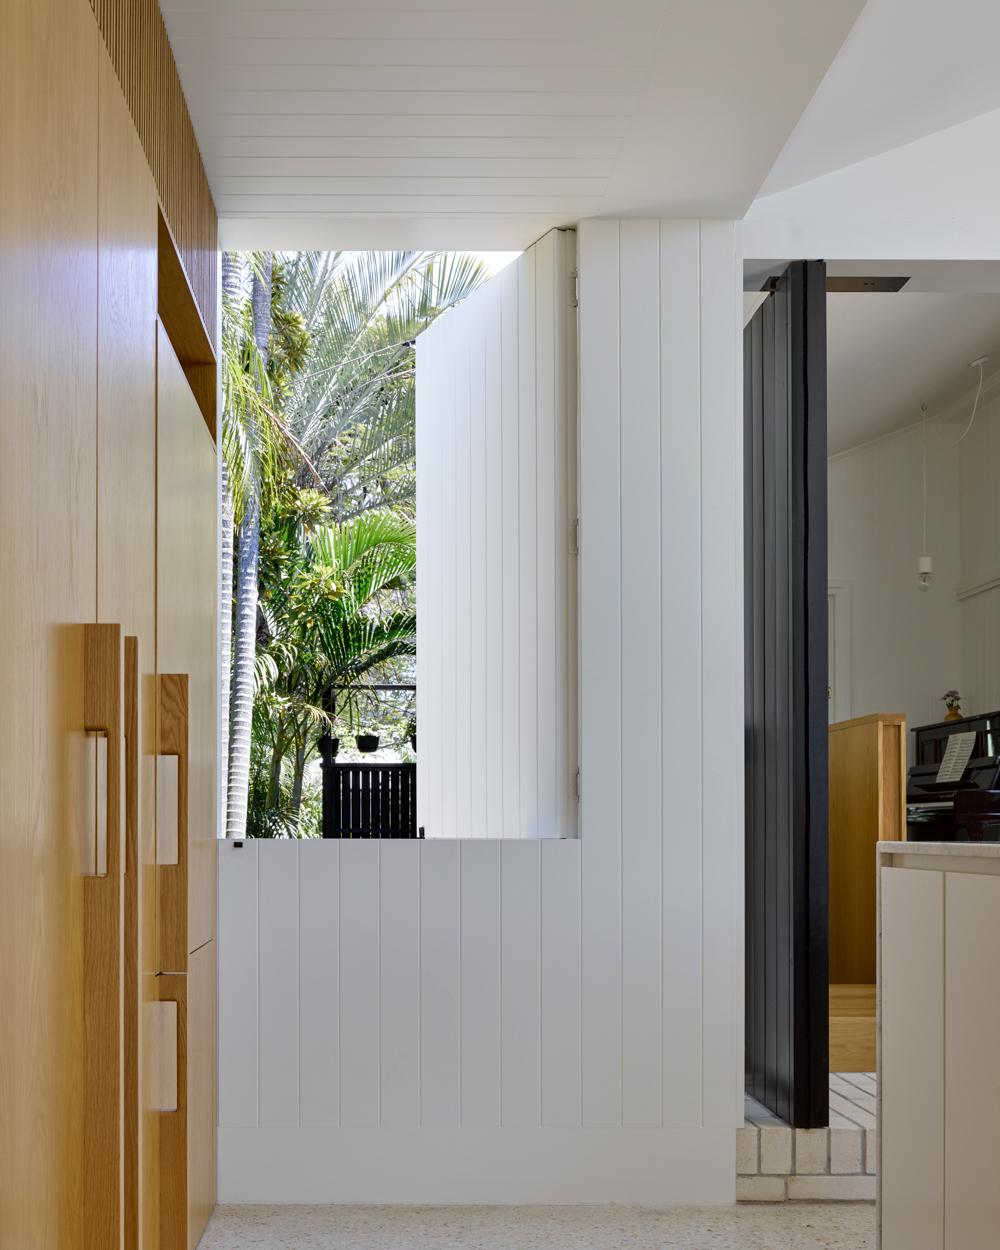 SP Studio - Jacaranda House-the-design-emotive-57164.jpg